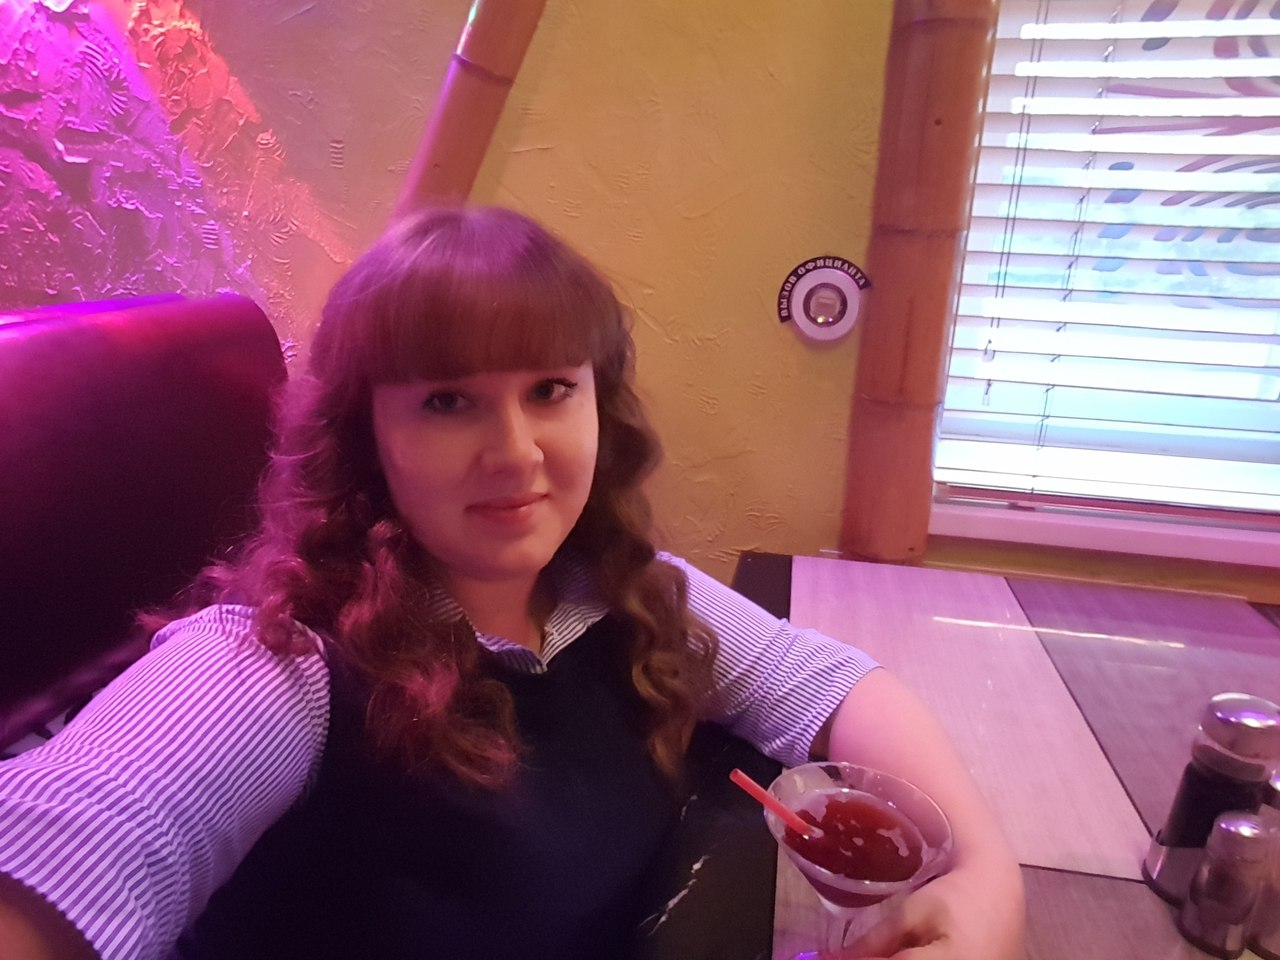 Ангелина Коваленко, Комсомольск-на-Амуре - фото №1